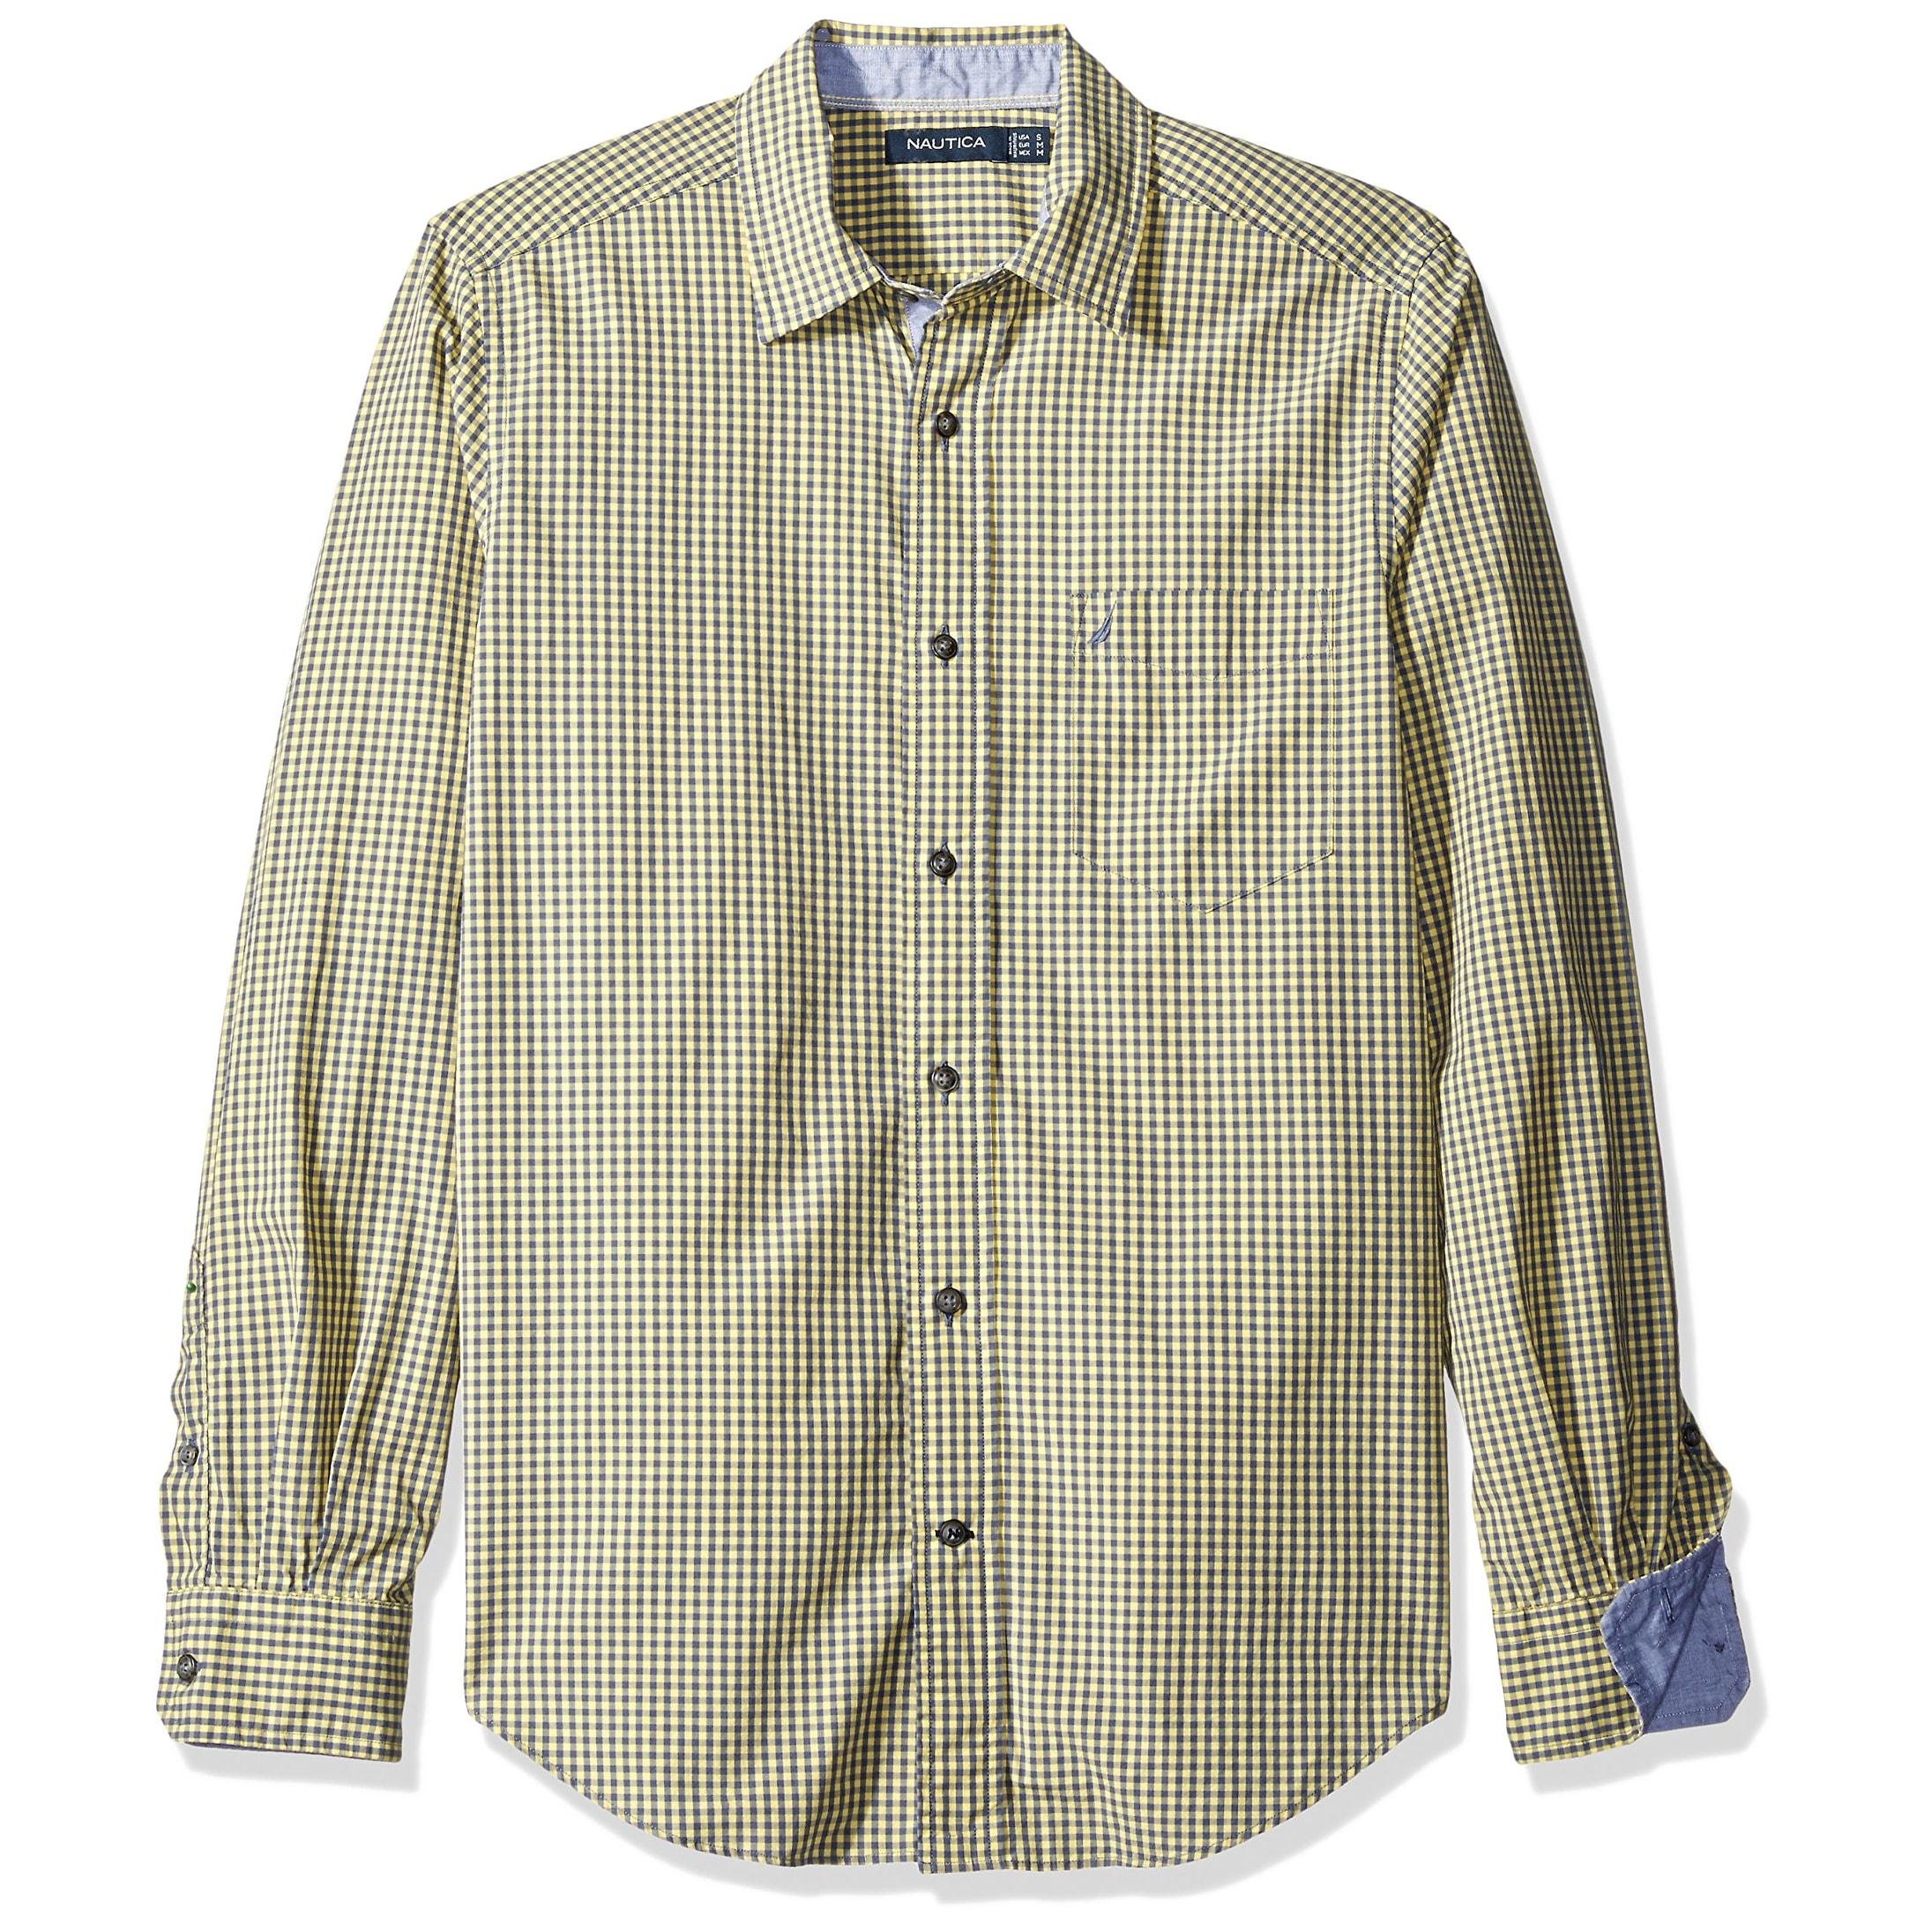 8704079a Nautica NEW Yellow Sunshine Mens Size Medium M Button Down Check Shirt